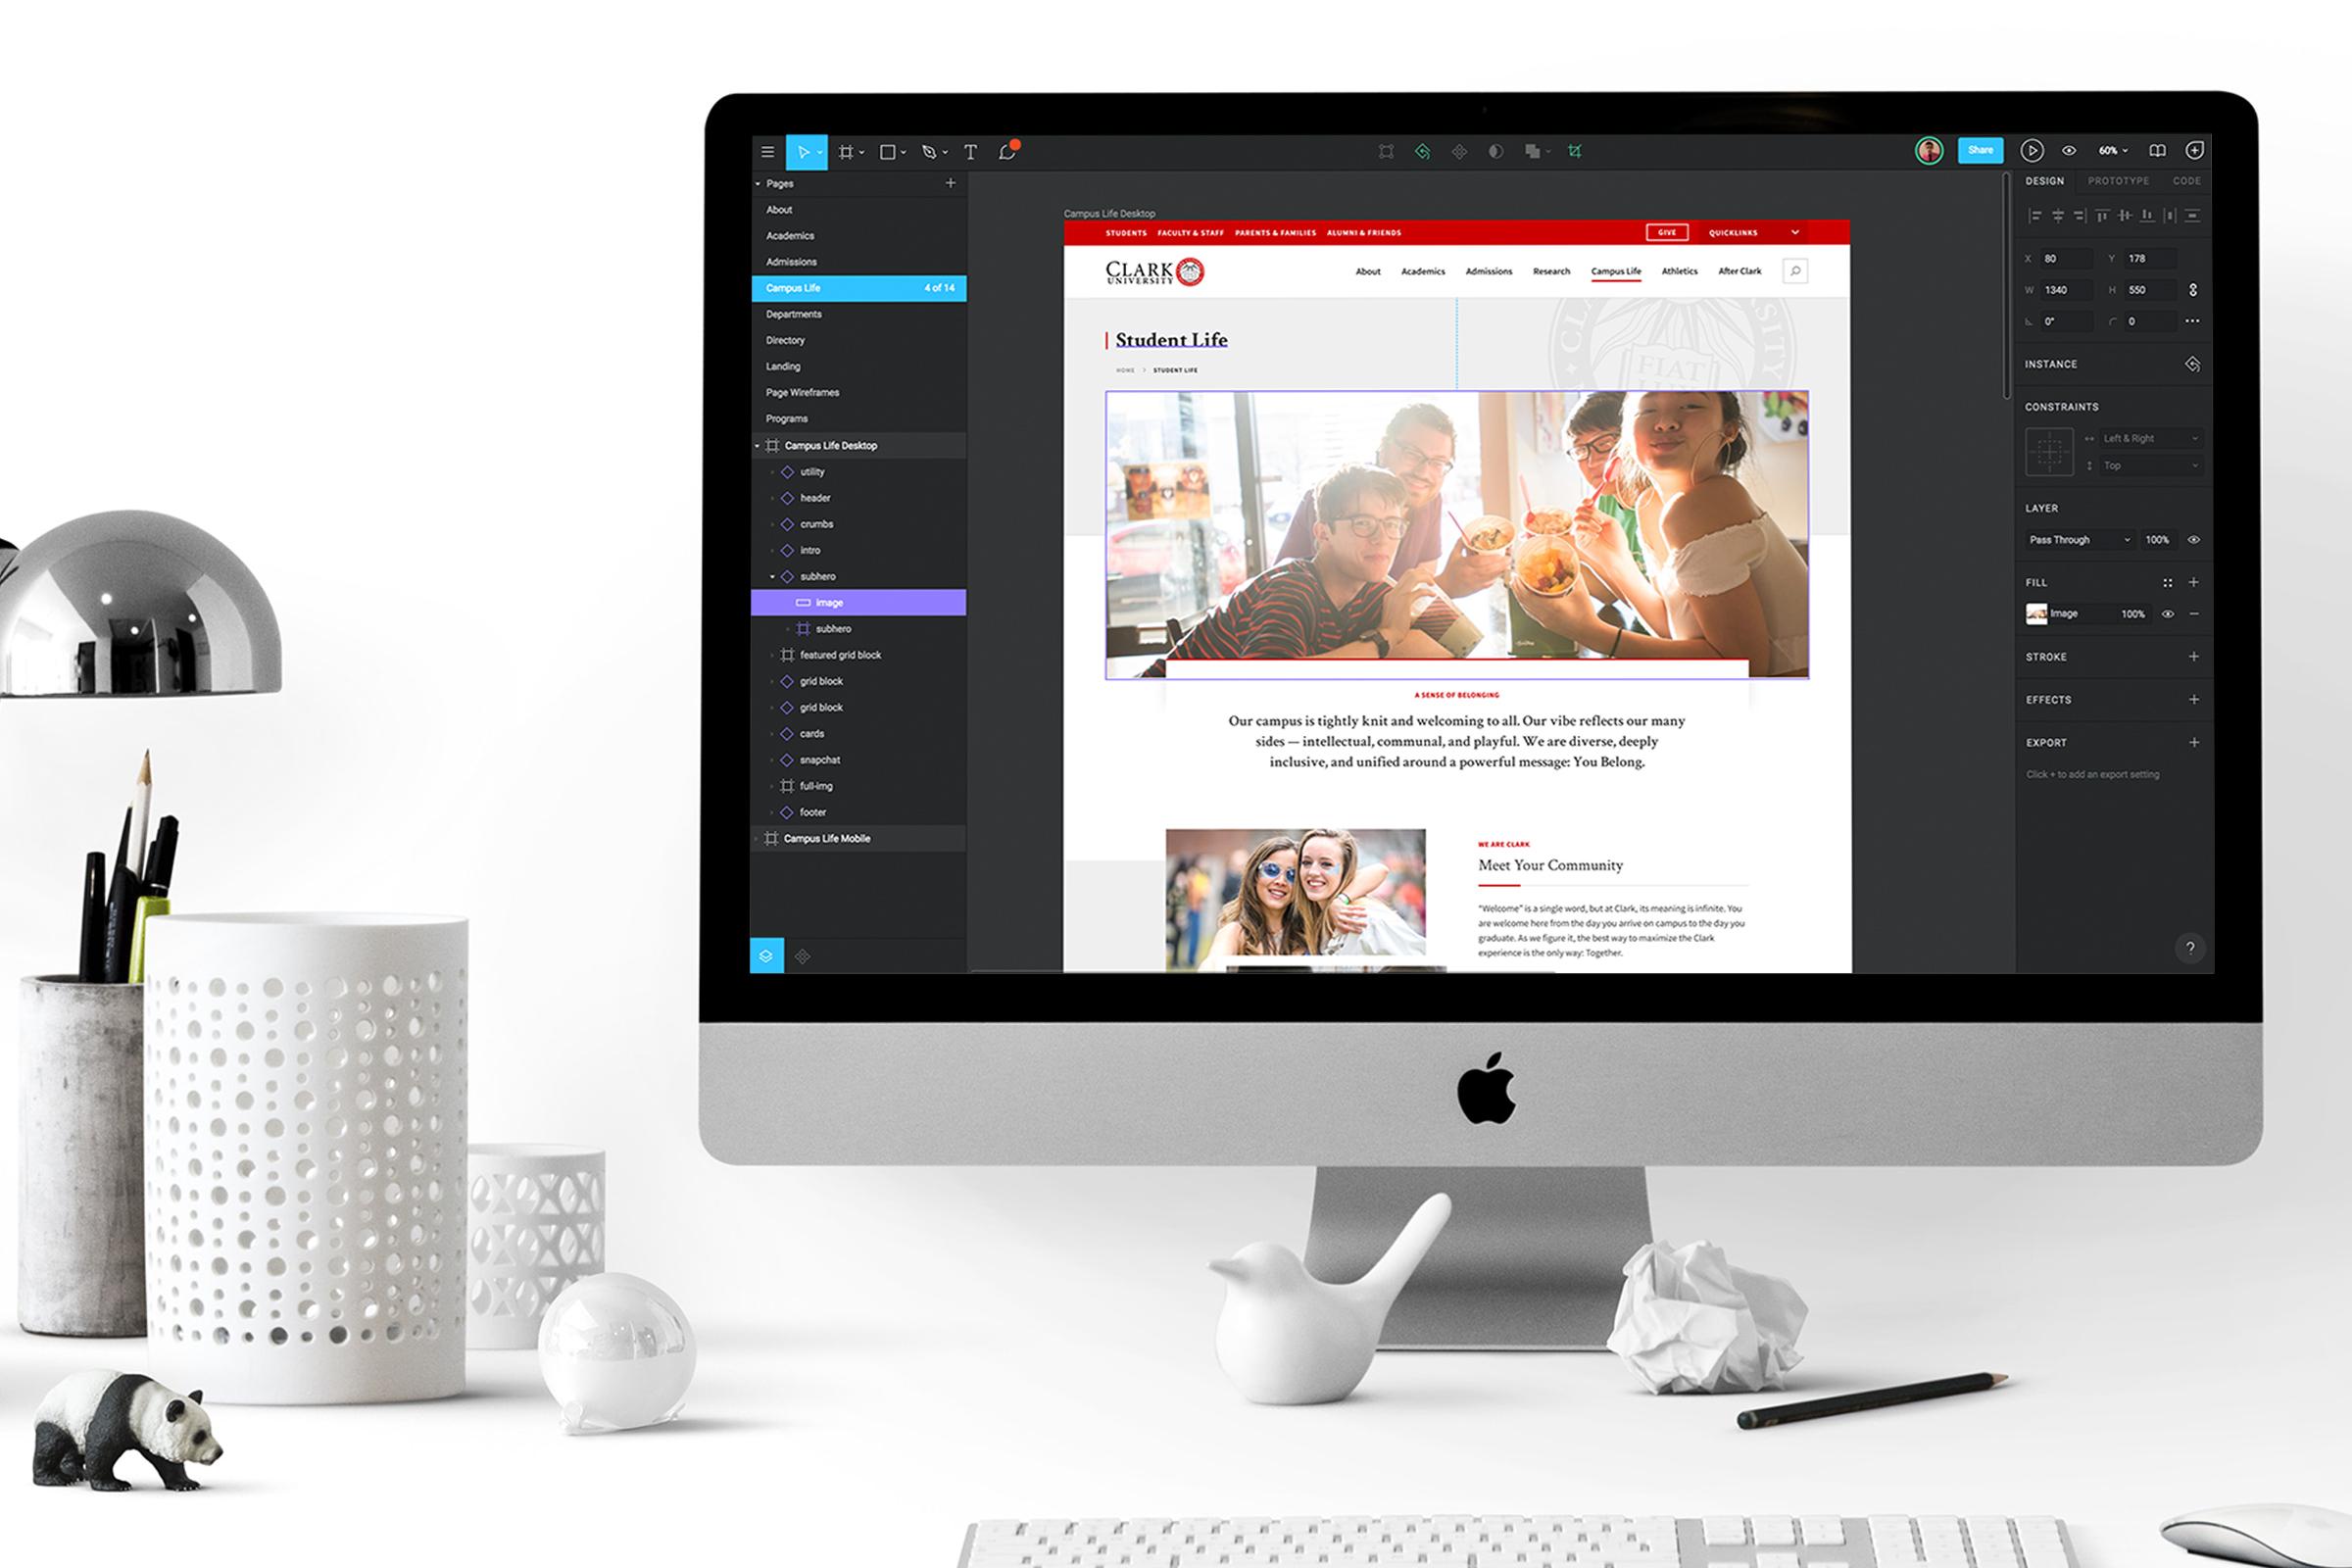 Design phase process of the Clark University website